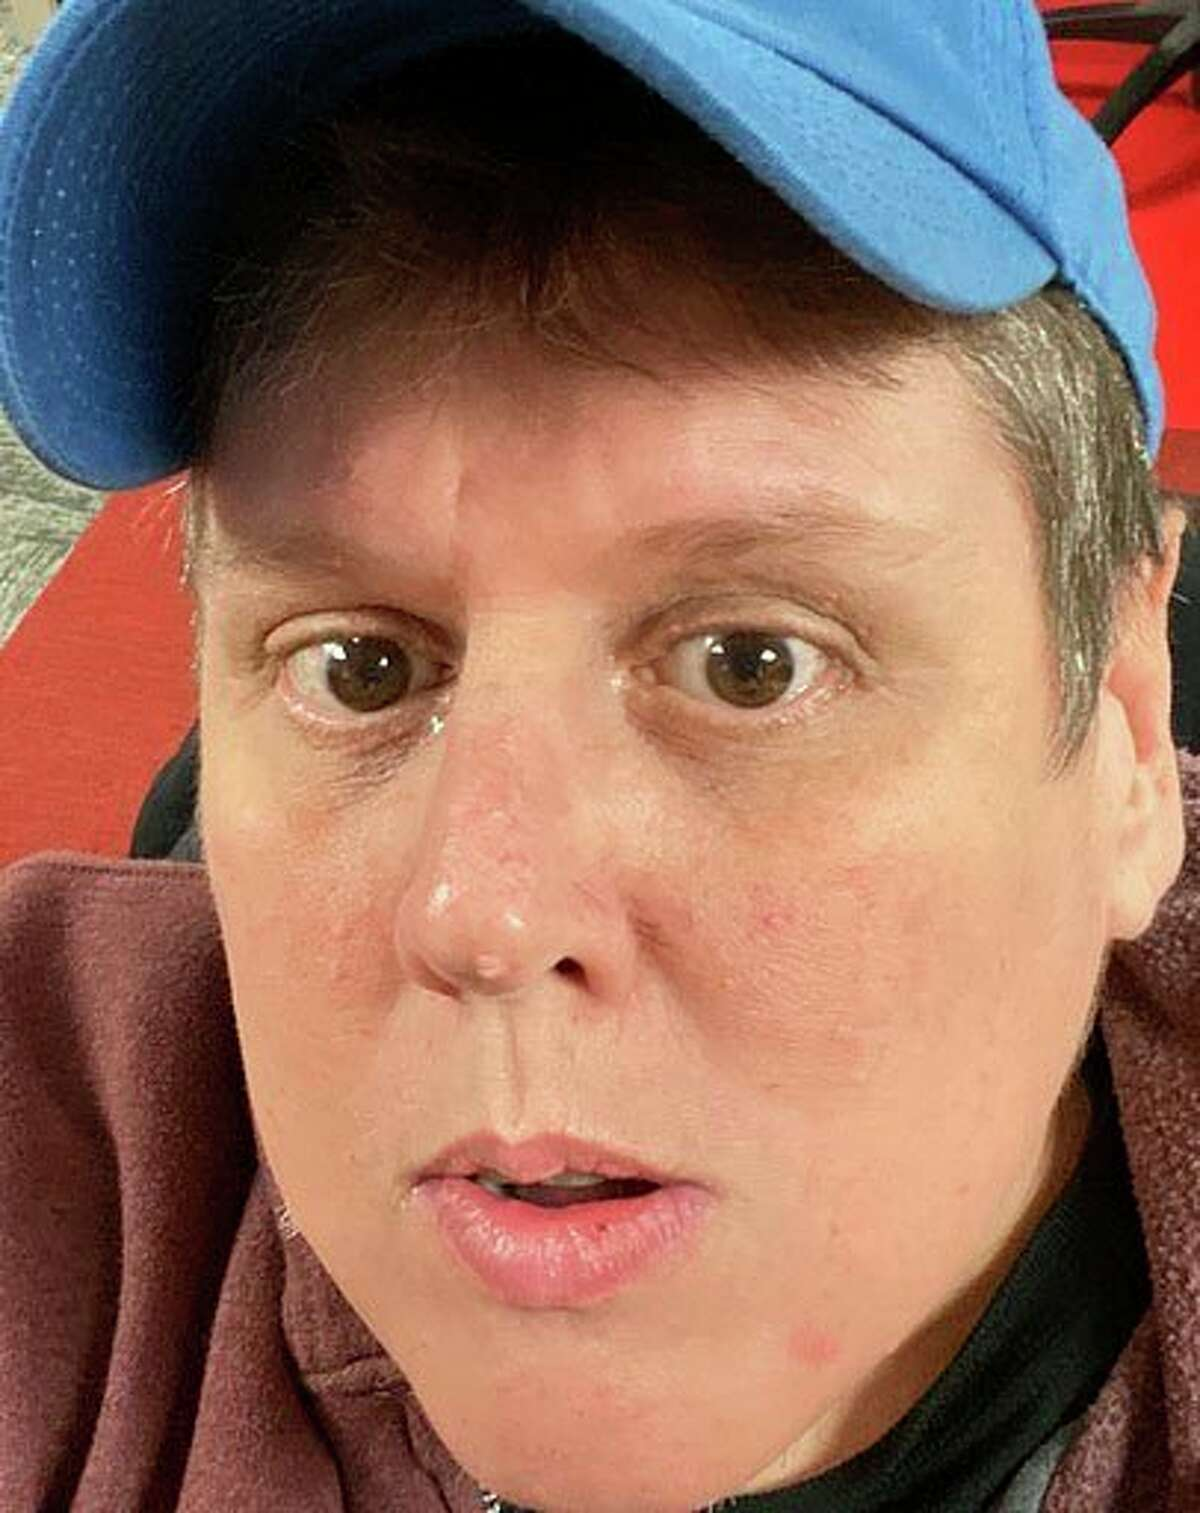 Huron Daily Tribune Sports Editor Mark Birdsall